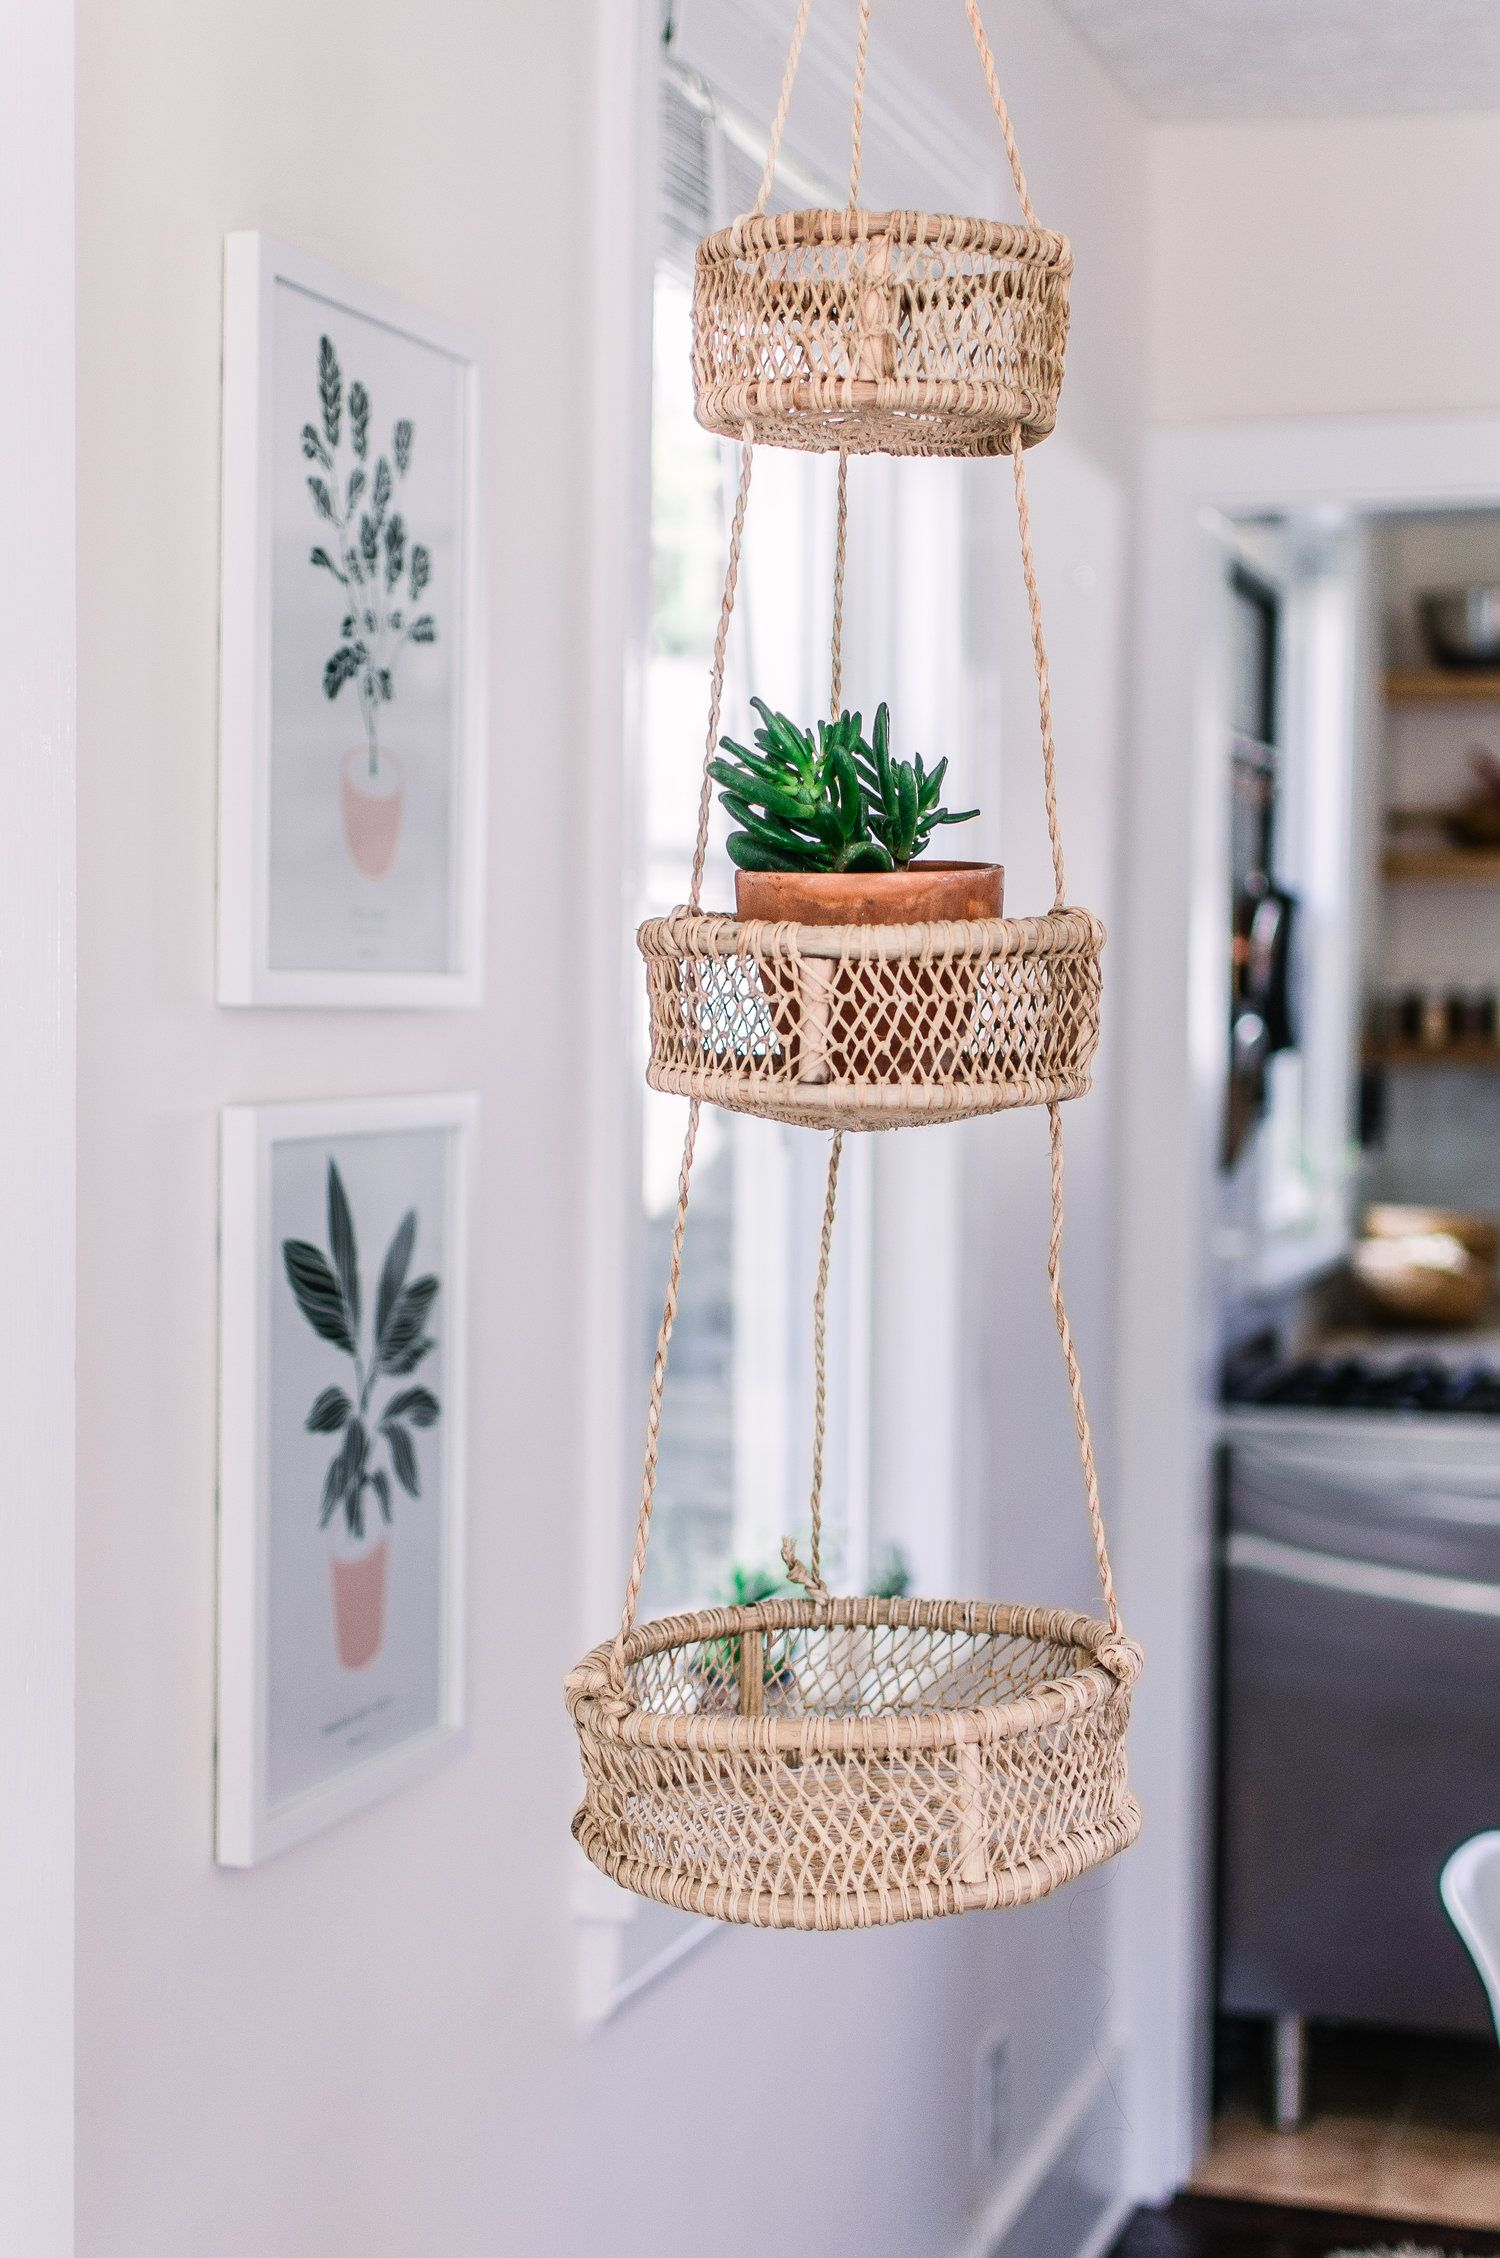 Dsc 0549 Jpg Hanging Fruit Baskets Decor Kitchen Wall Decor